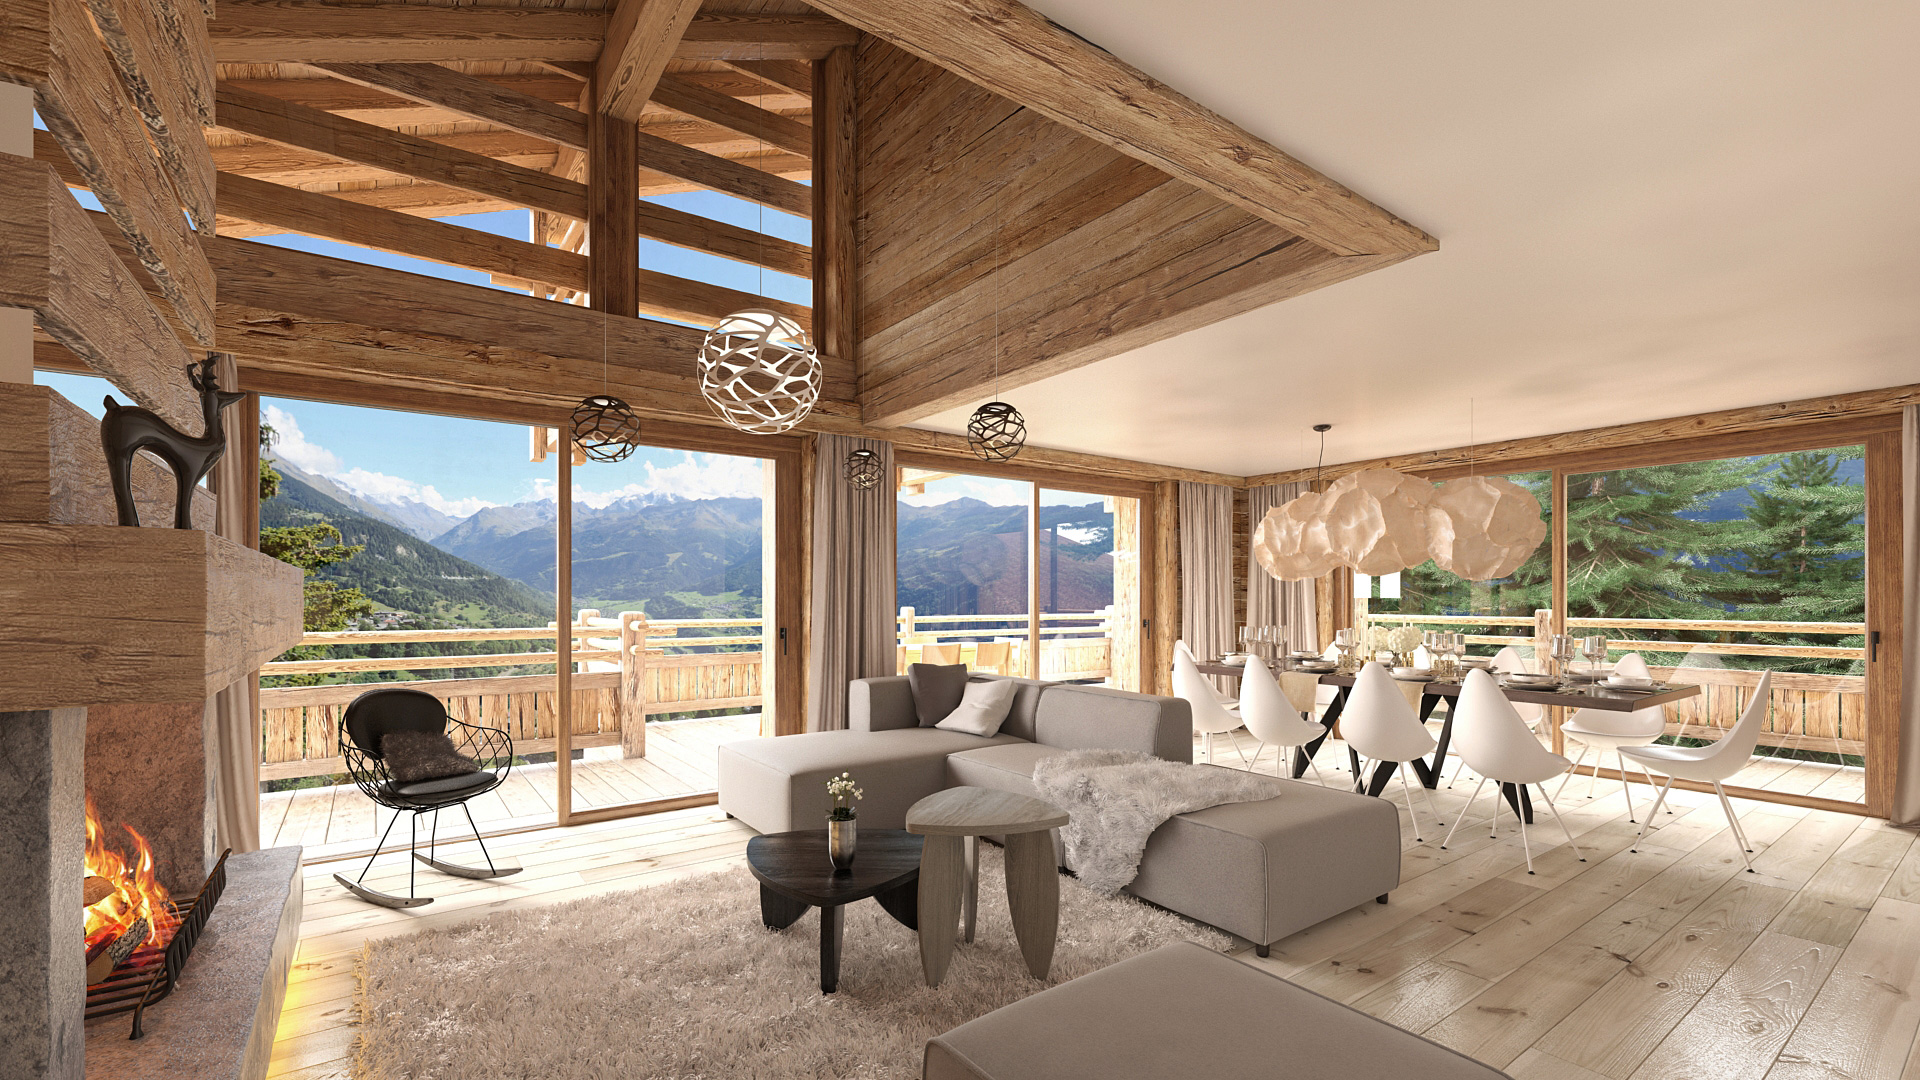 Mayens de Chevillard Chalet, Switzerland